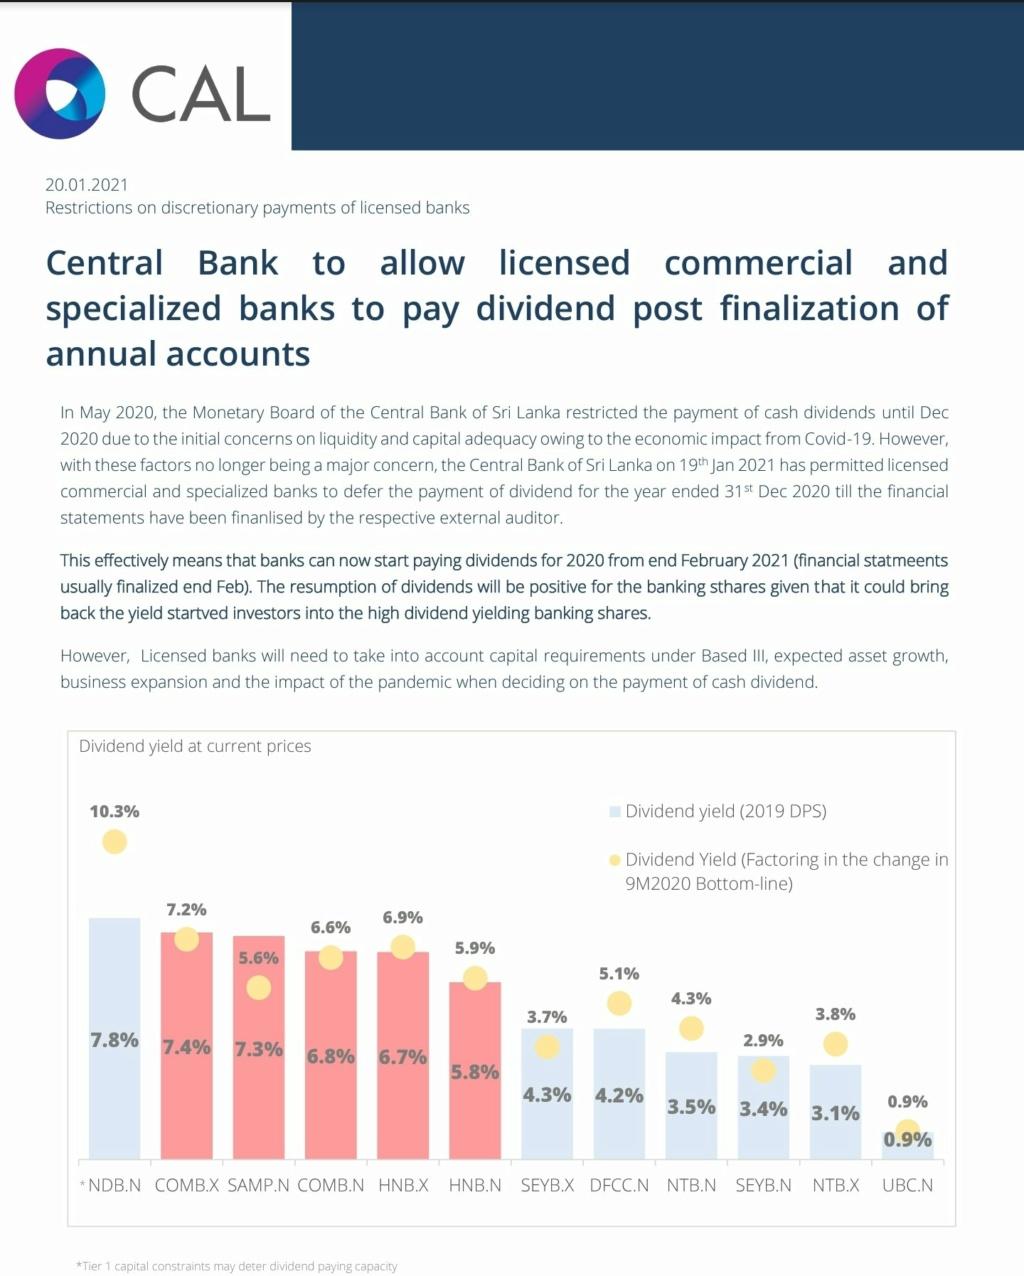 BANKING SECTOR Ndb10